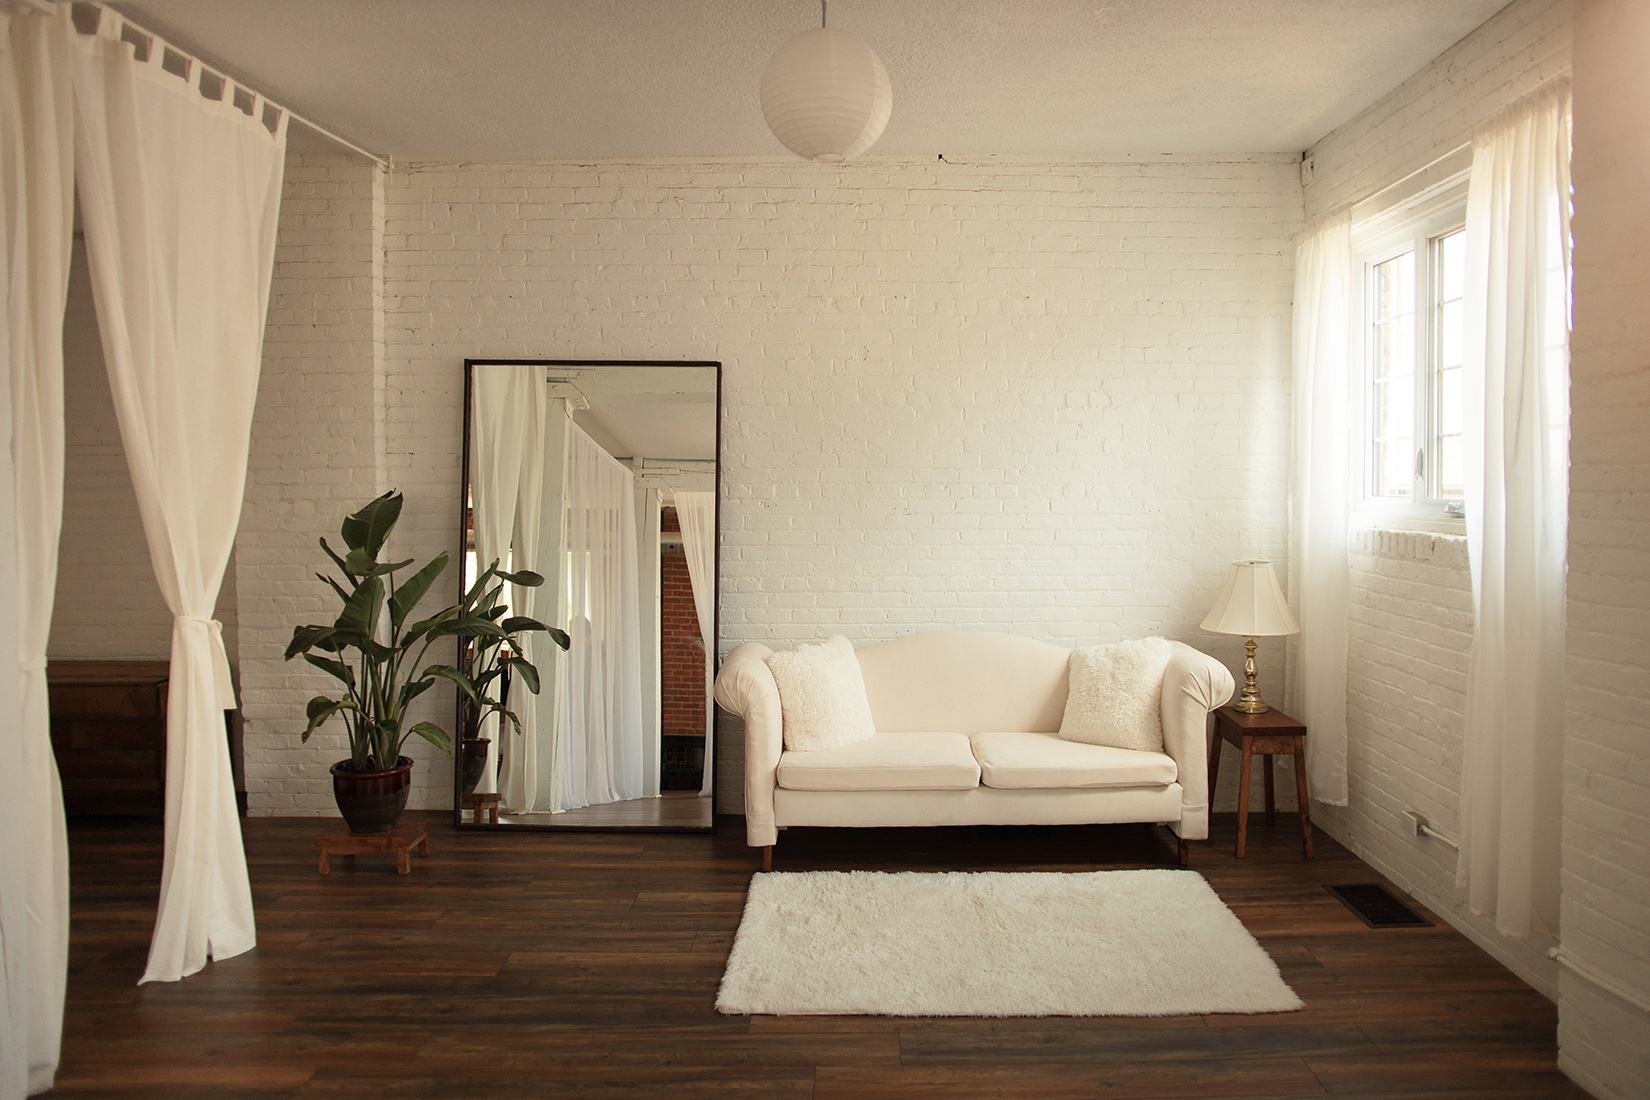 the-lunar-loft-hamilton-photo-studio-toronto-brand-photographer-lifestyle (2).jpg